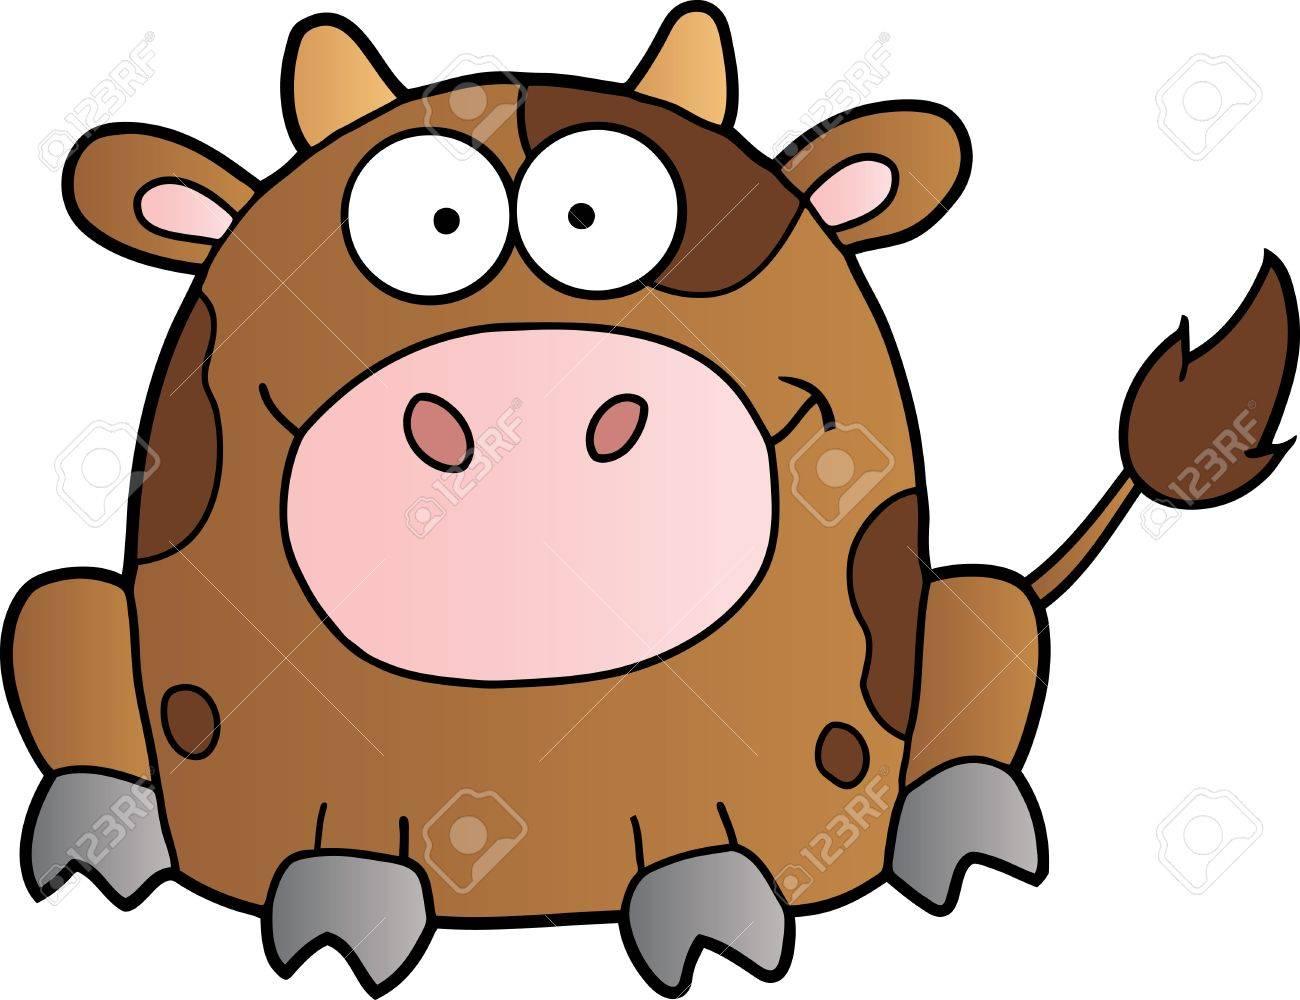 Cute Brown Cow Cartoon Mascot Character Stock Vector - 10049771